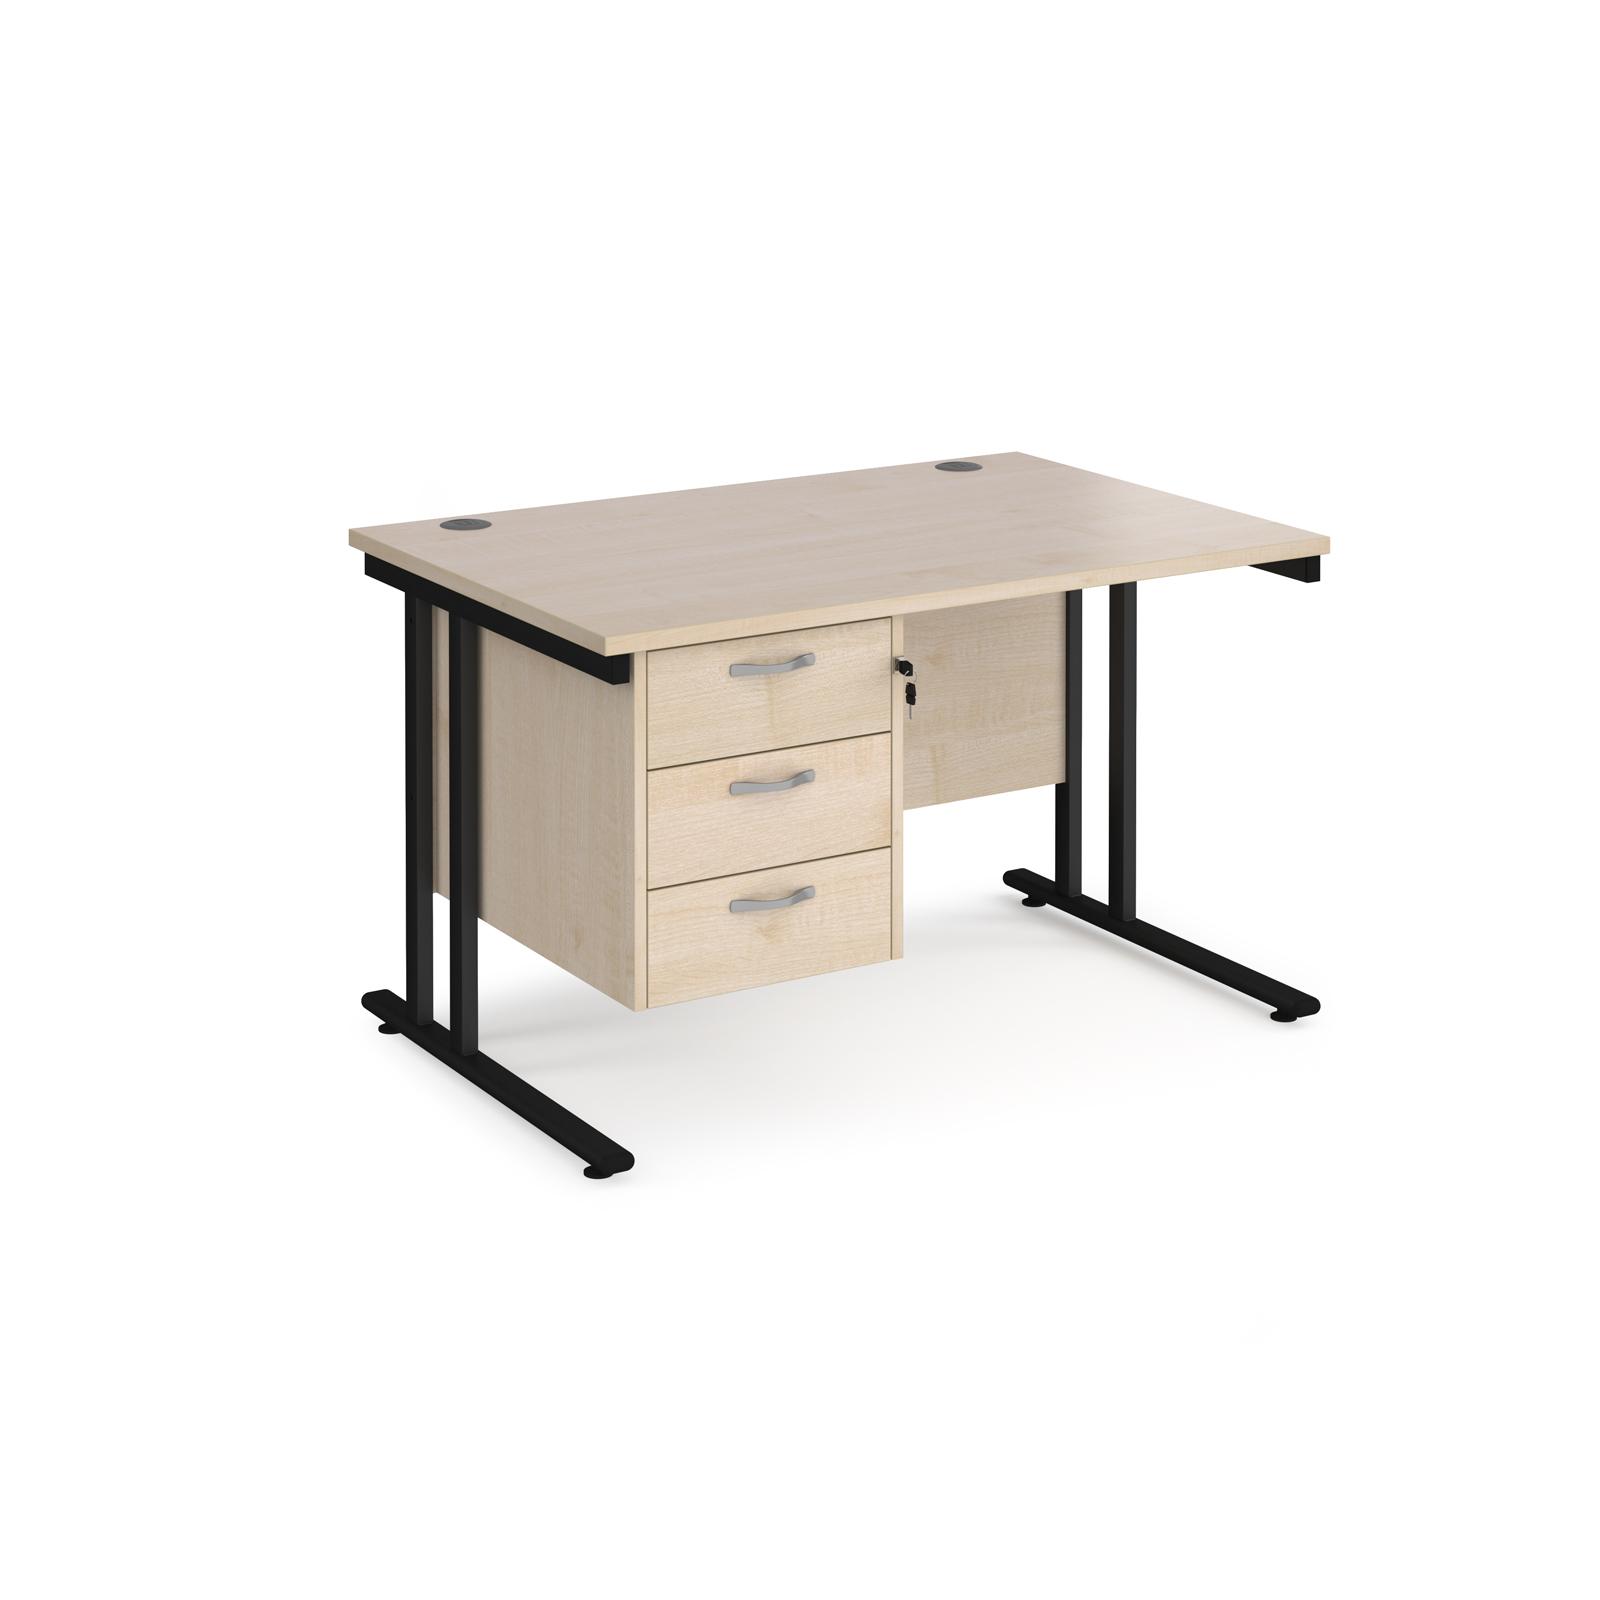 Rectangular Desks Maestro 25 straight desk 1200mm x 800mm with 3 drawer pedestal - black cantilever leg frame, maple top